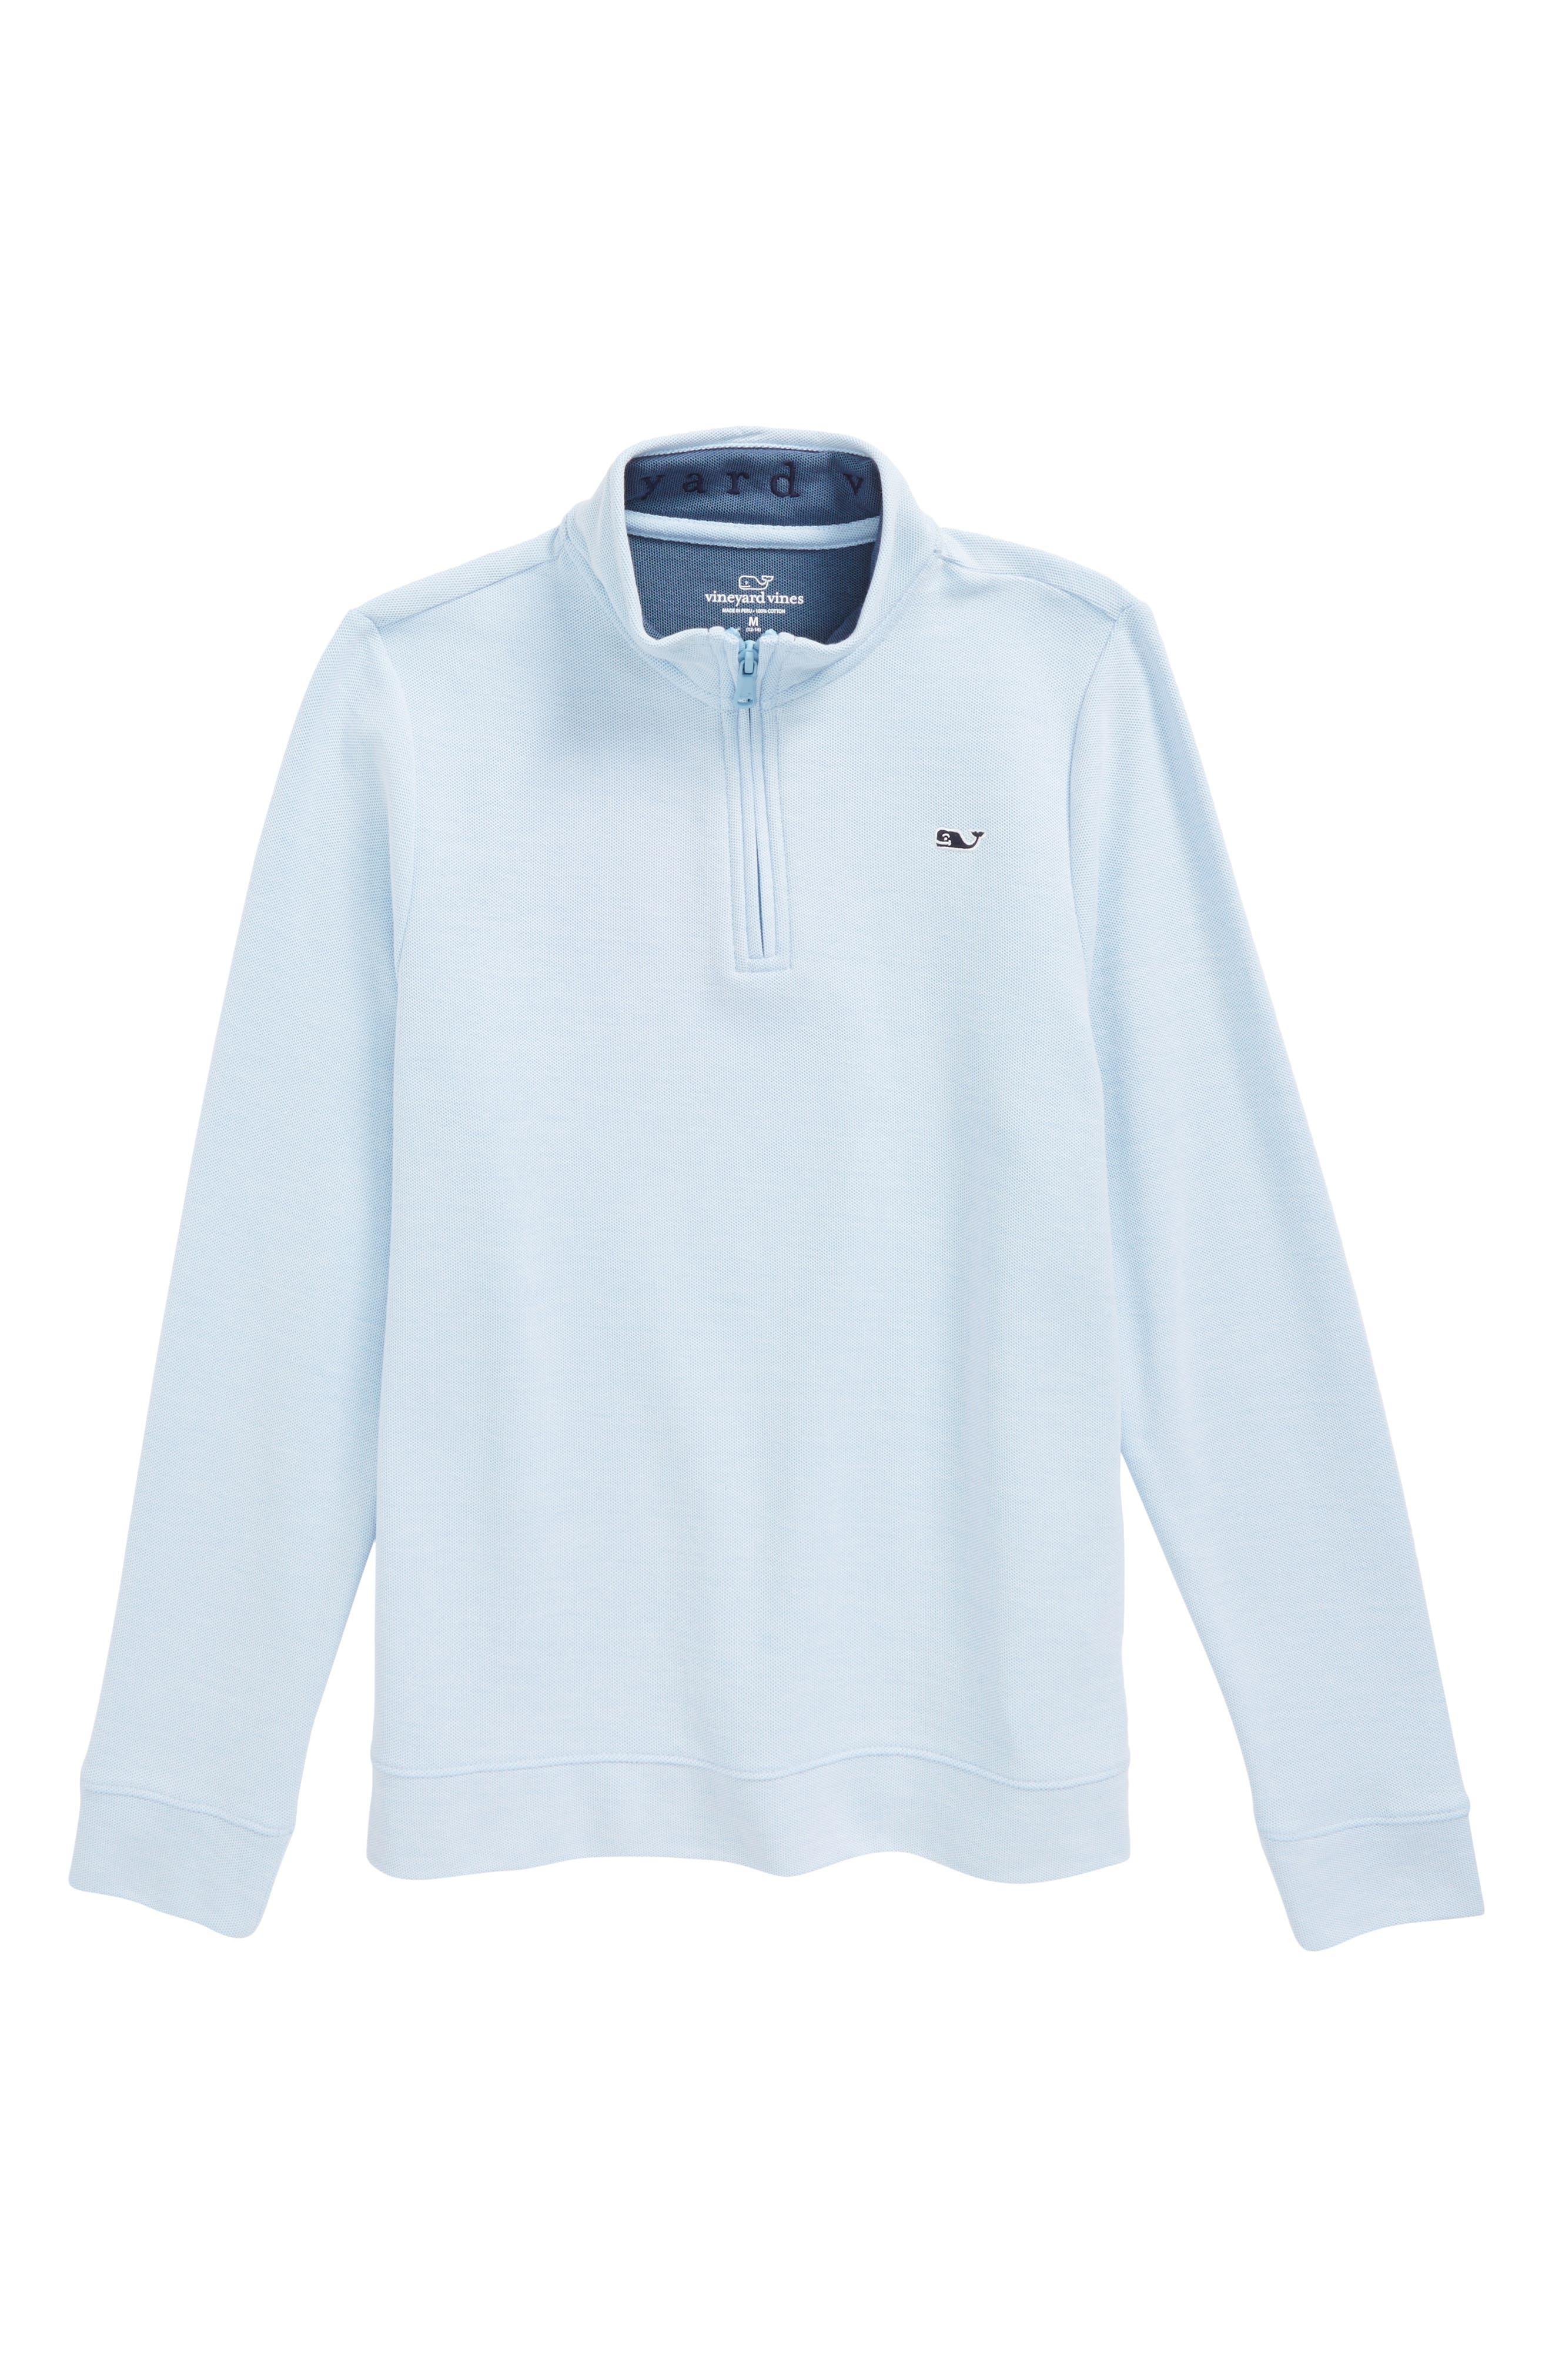 Quarter Zip Sweater,                             Main thumbnail 1, color,                             Ocean Breeze